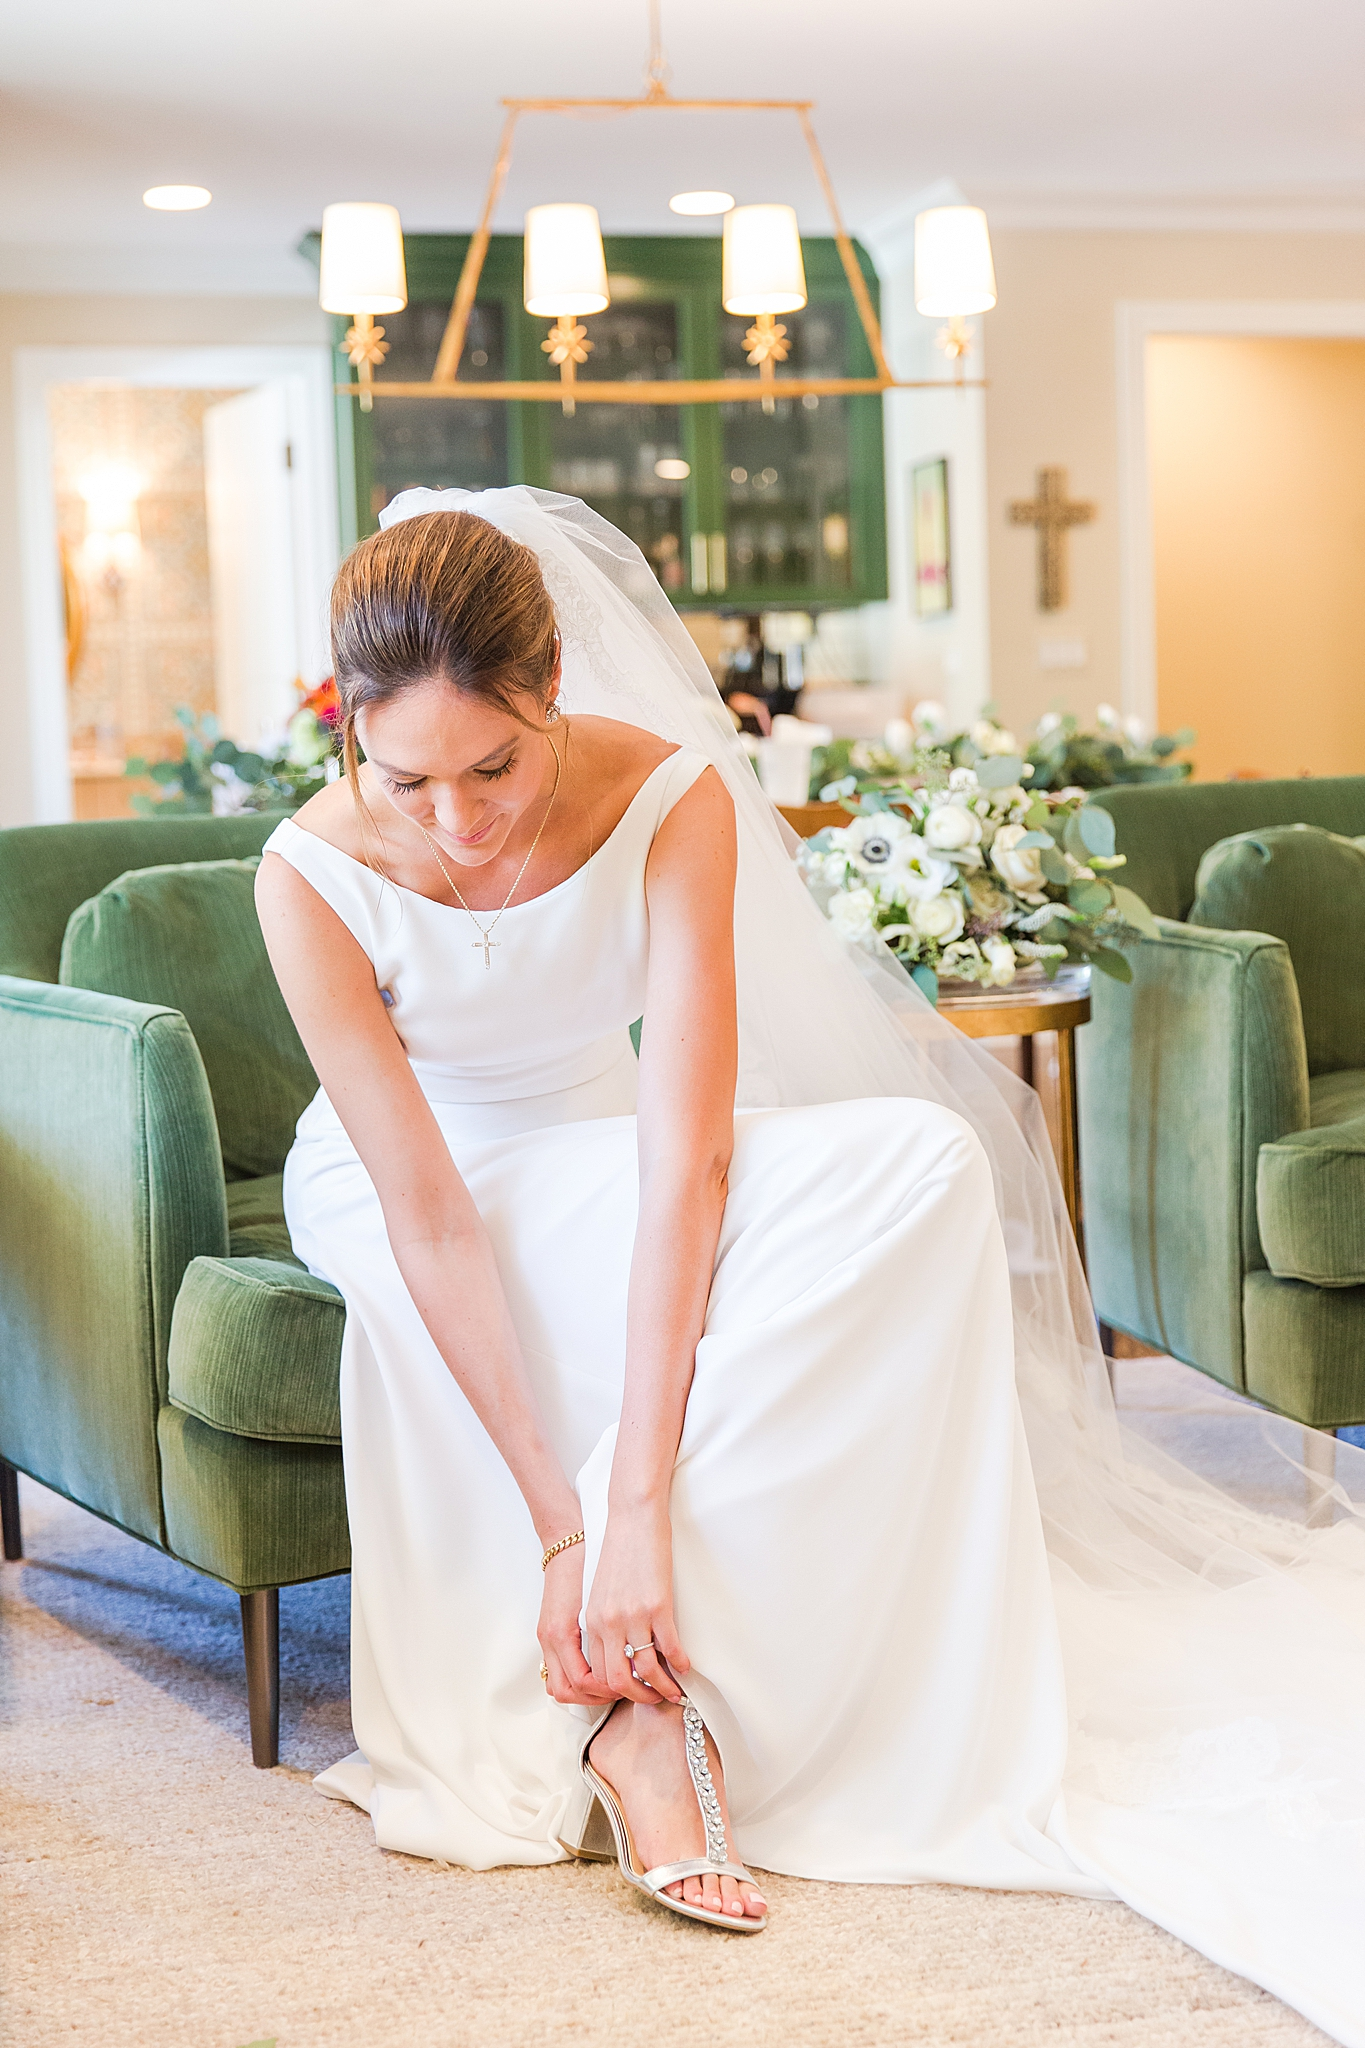 detroit-wedding-photographer-grosse-pointe-academy-chapel-detroit-golf-club-wedding-carly-matt-by-courtney-carolyn-photography_0017.jpg